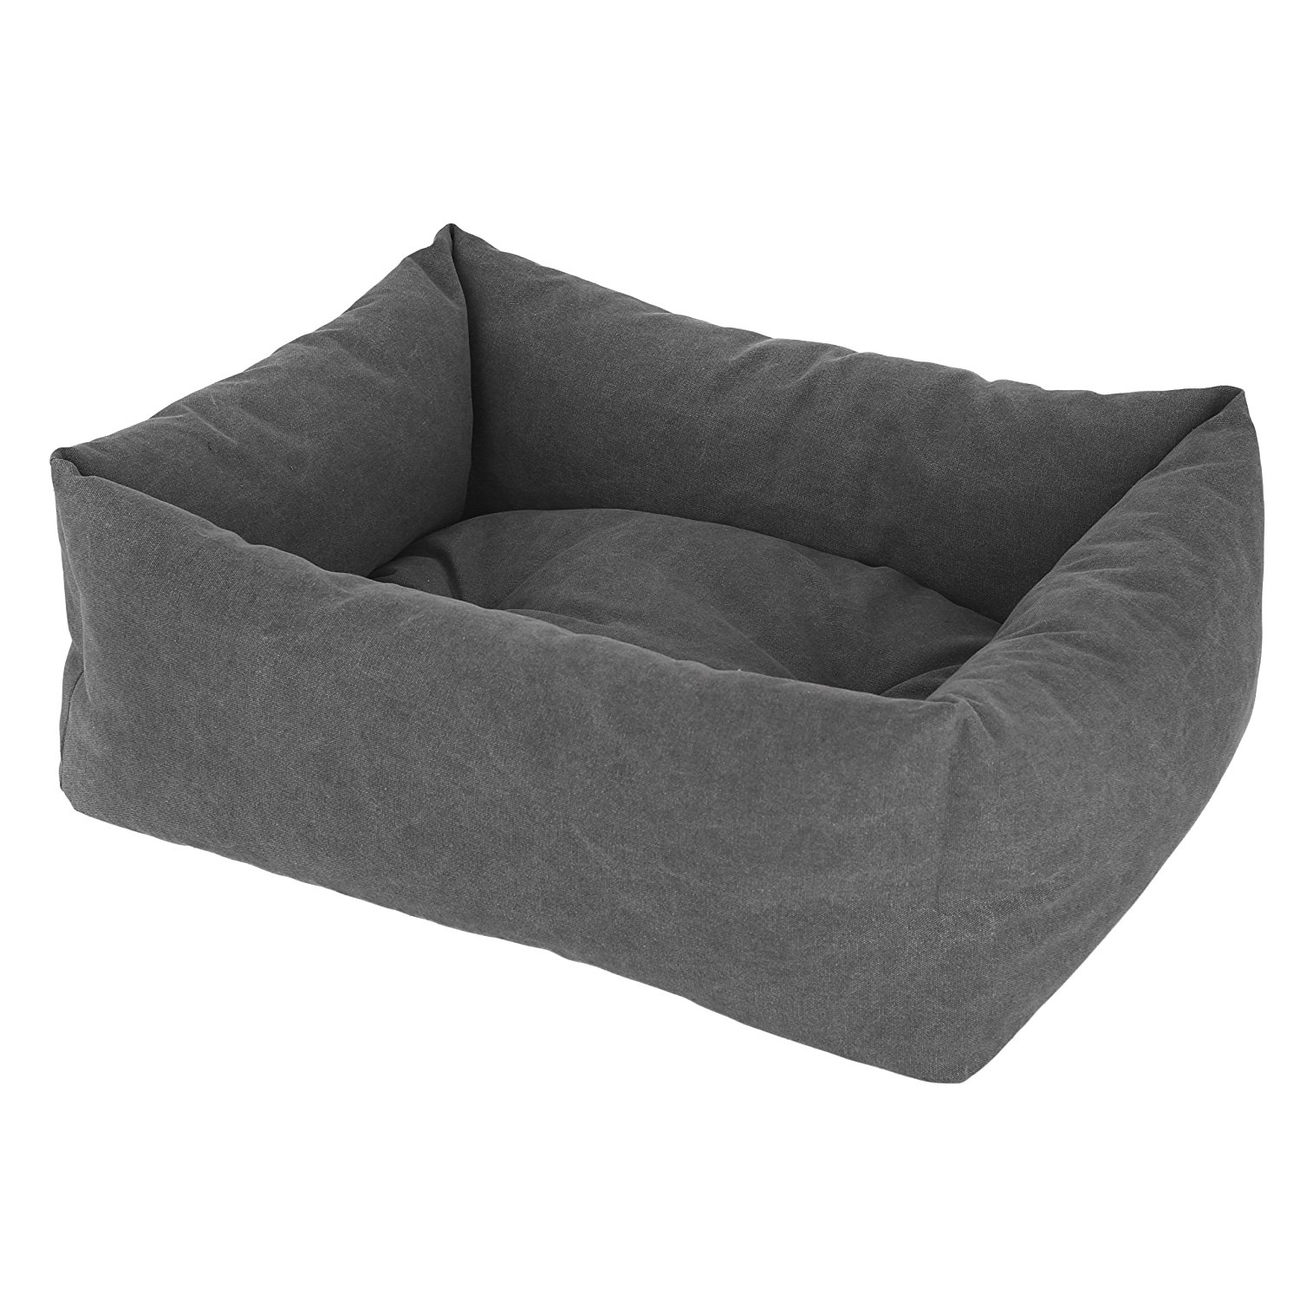 Kerbl Hundebett Lucca grau, 70x85 cm